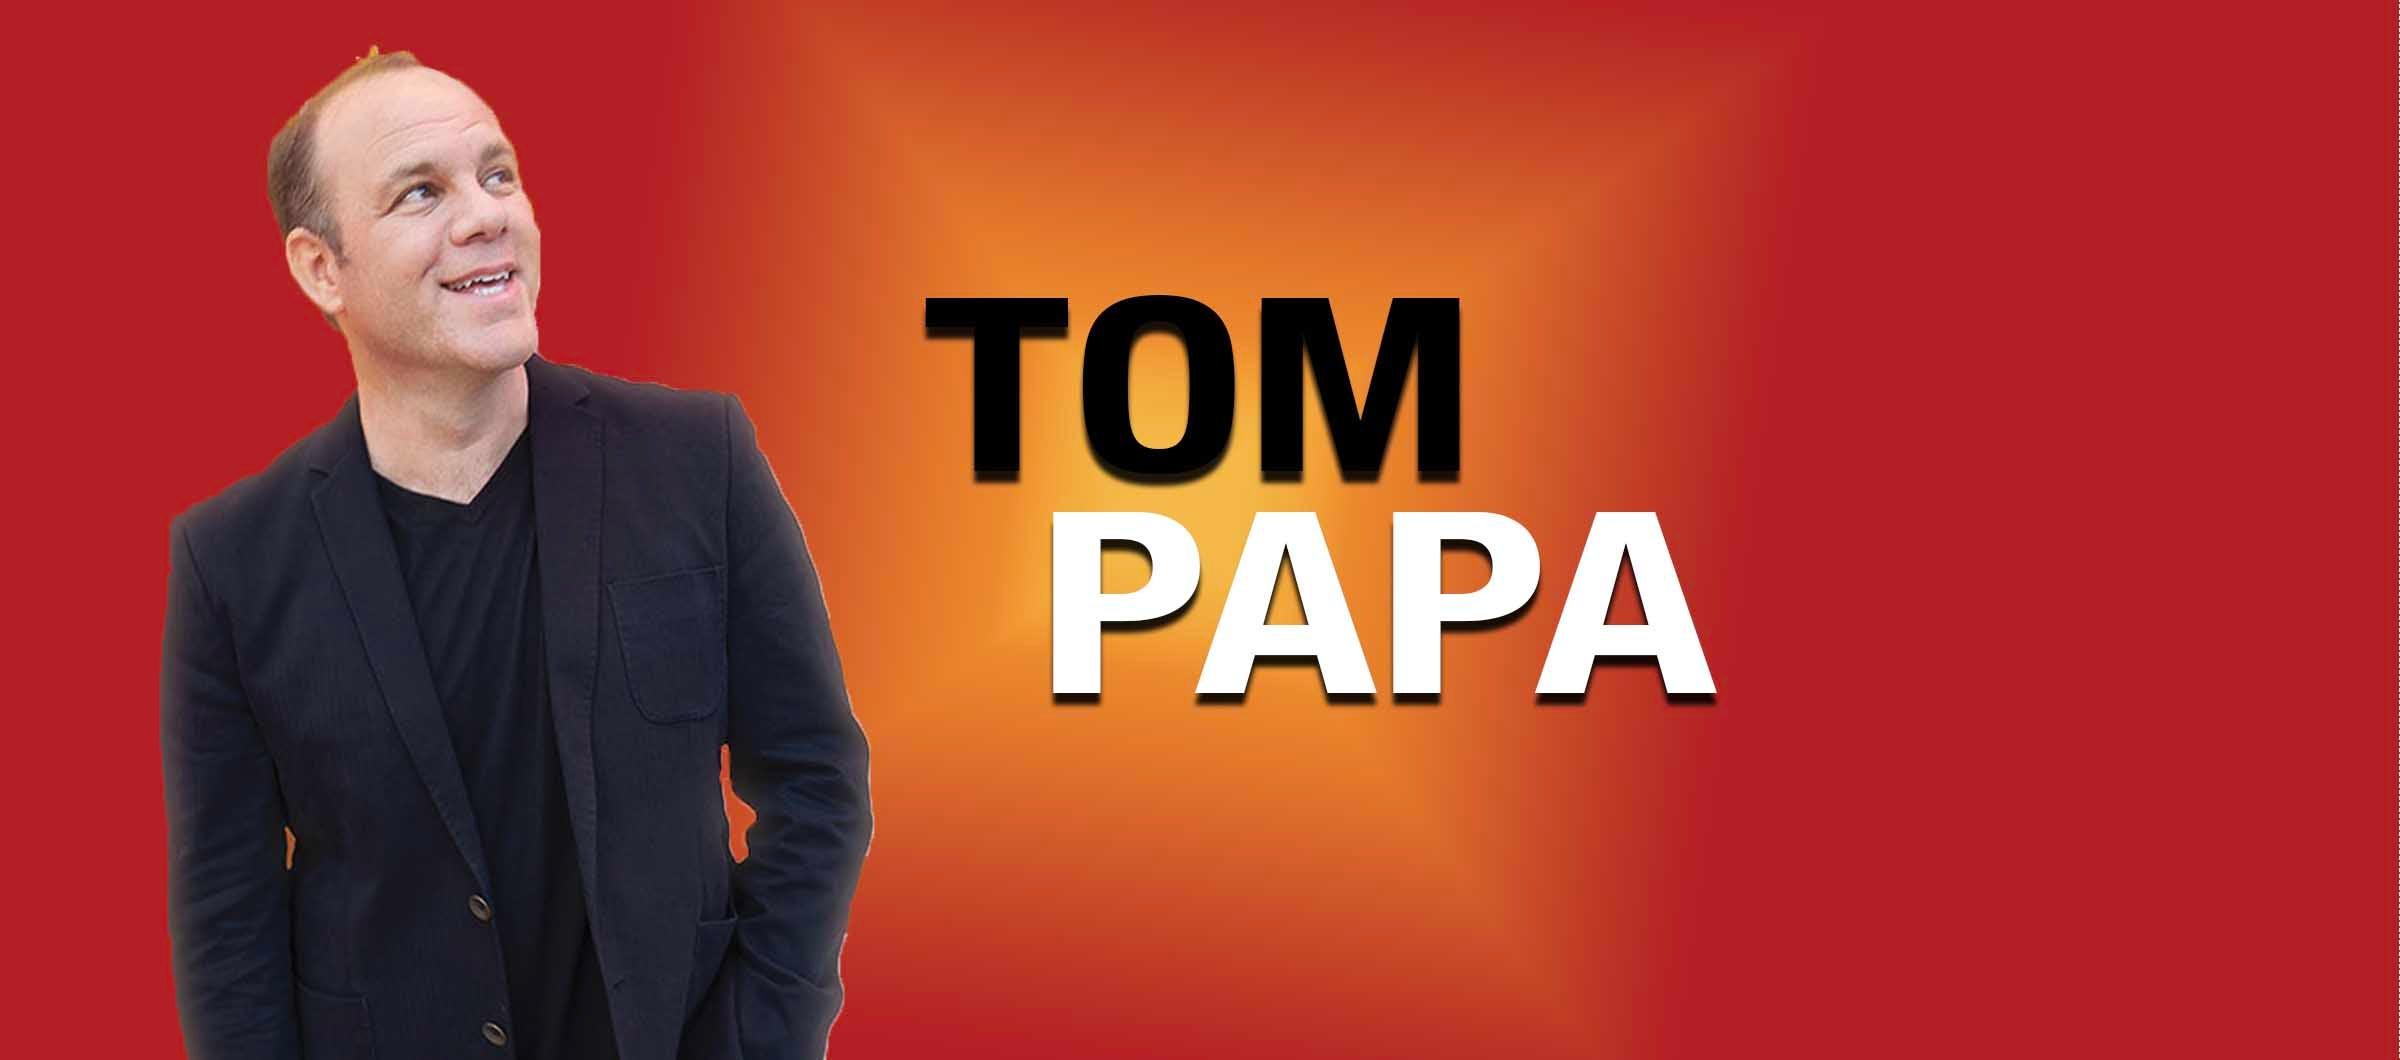 9th Annual Comedy Night for Crohn's & Colitis presents Tom Papa